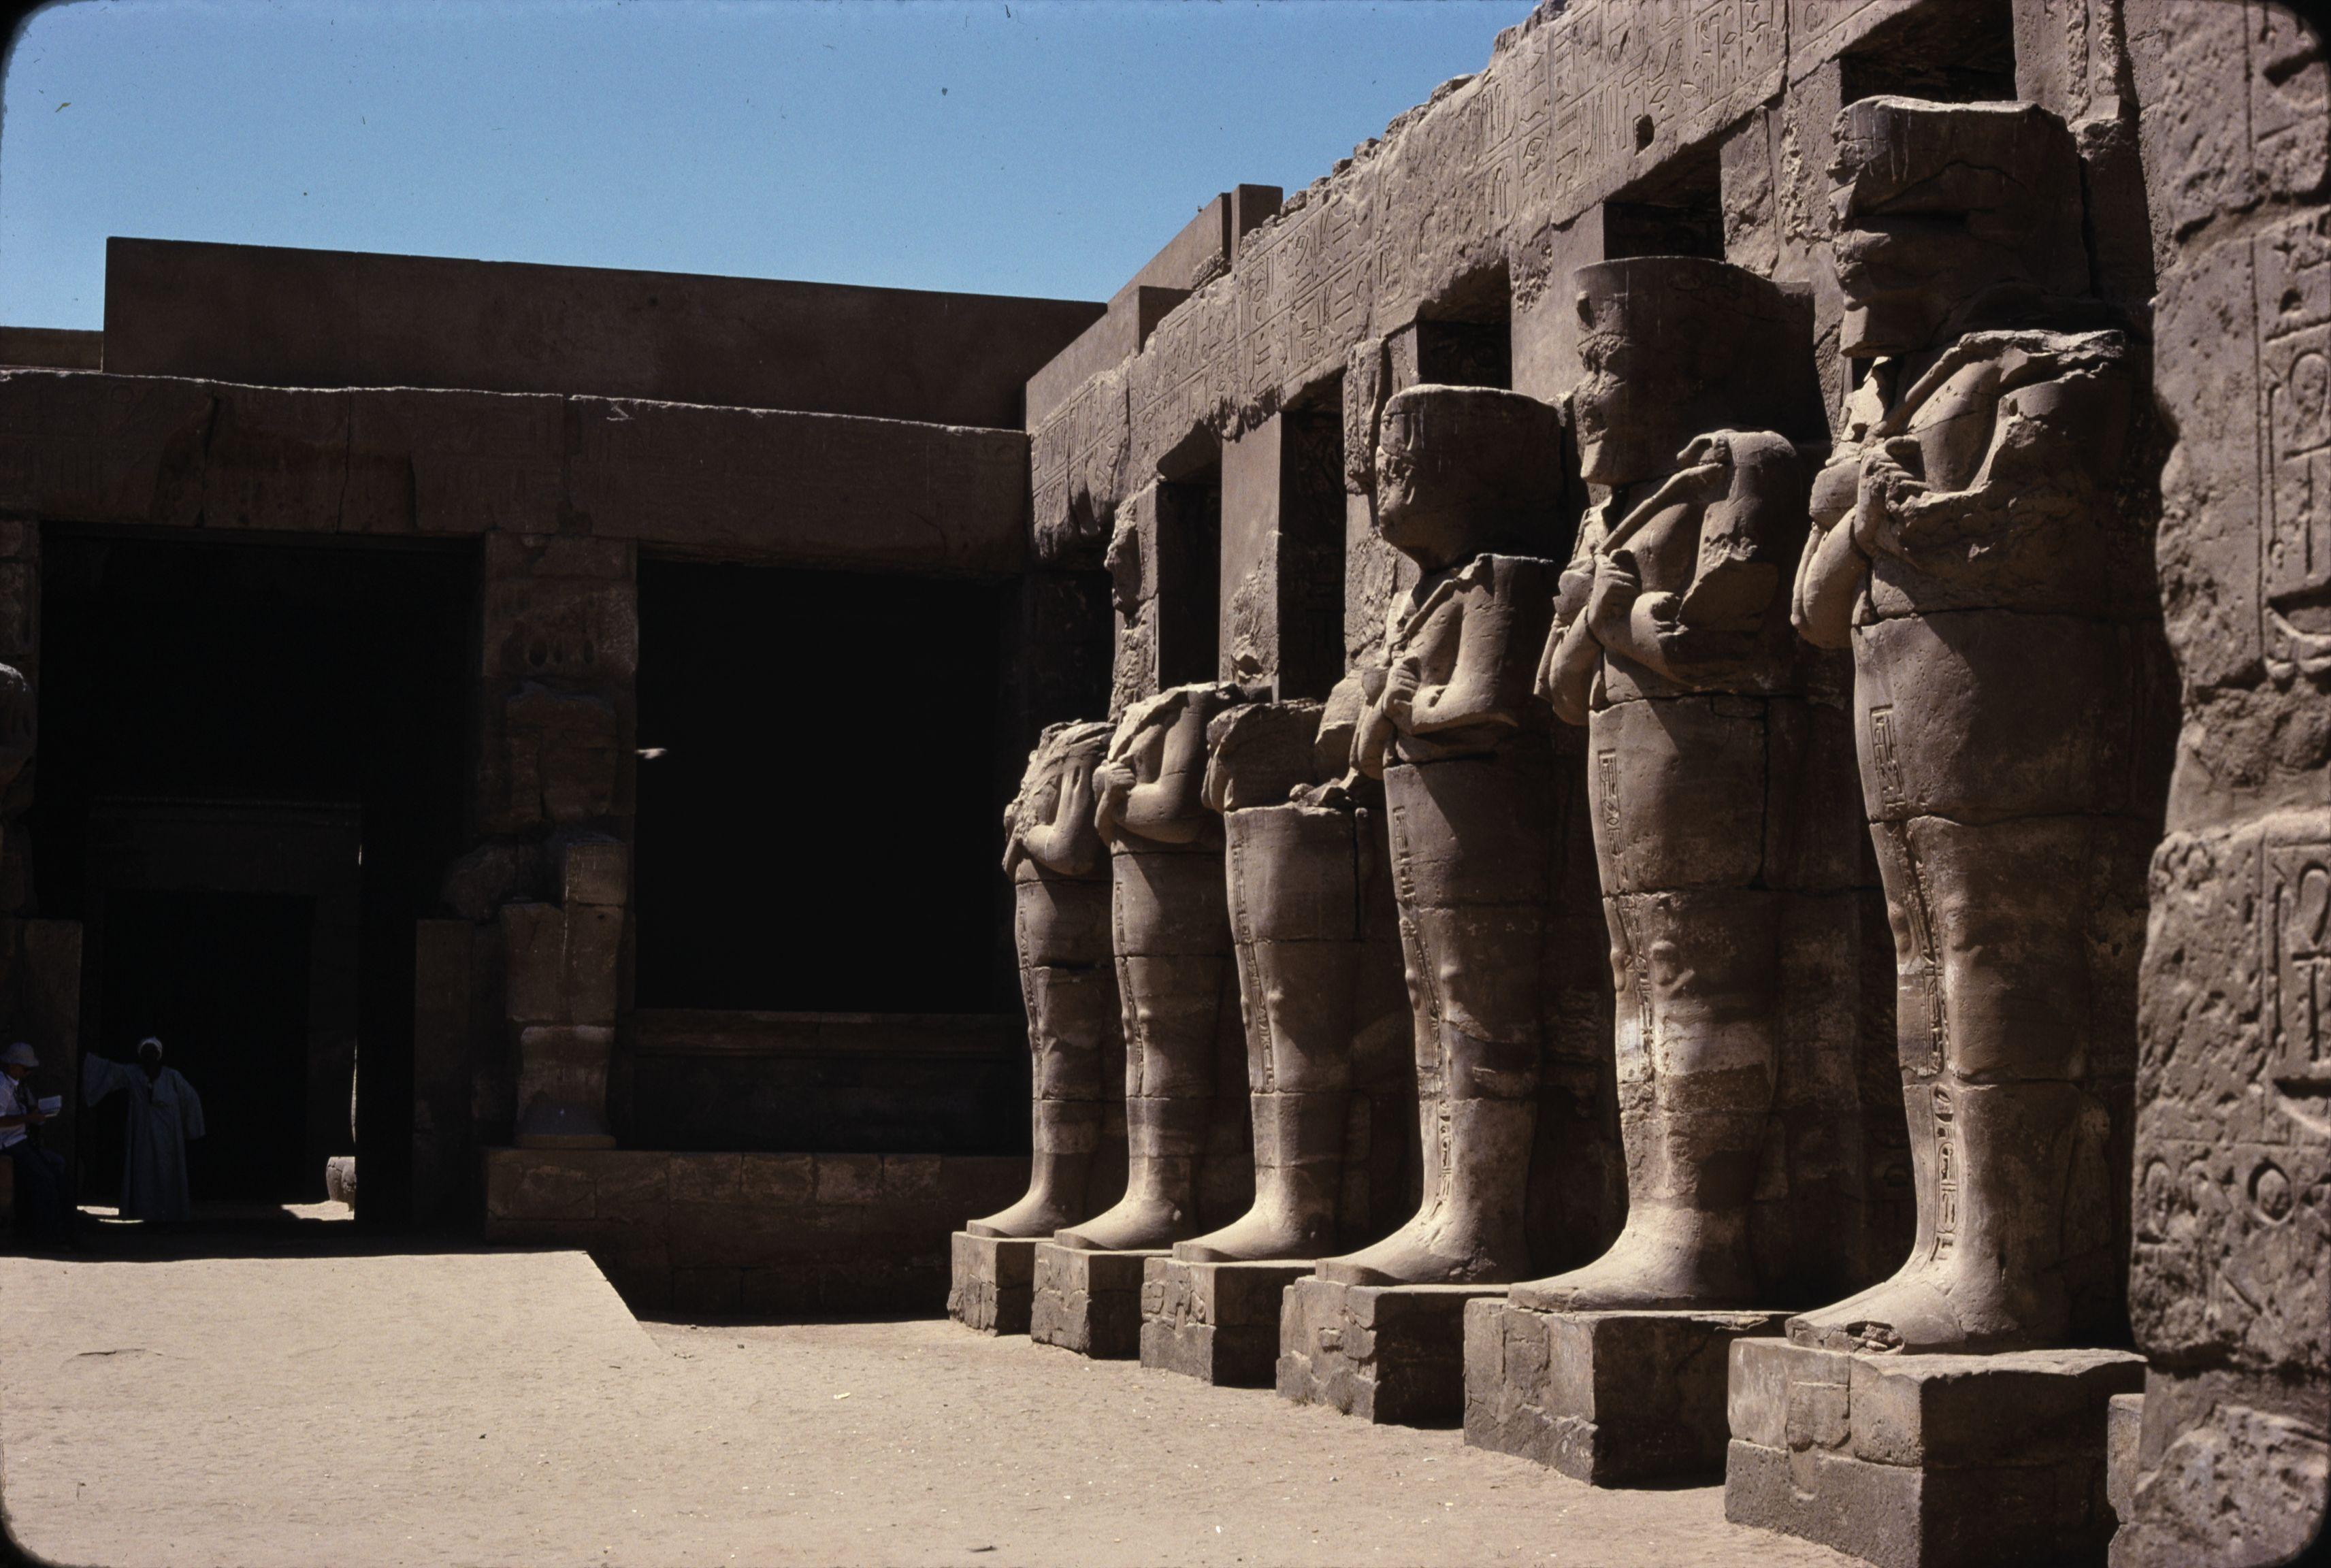 Храм Амона-Ра. Портик с осирическими статуями во дворе храма Рамсеса III (внутри храма Амона)